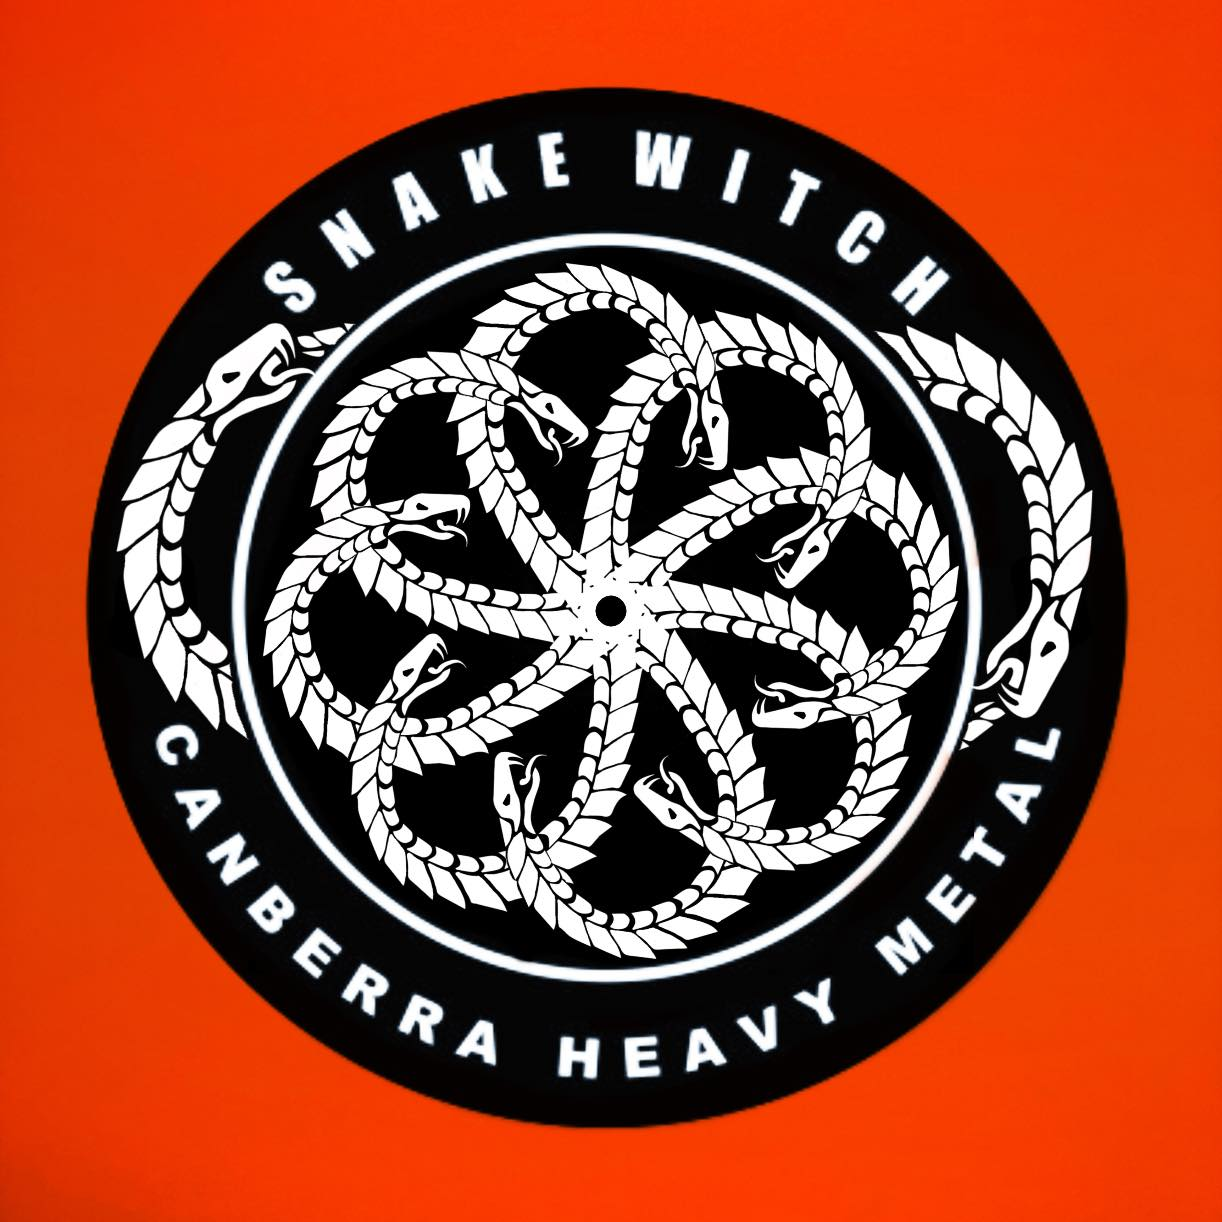 snakewitch sticker patch